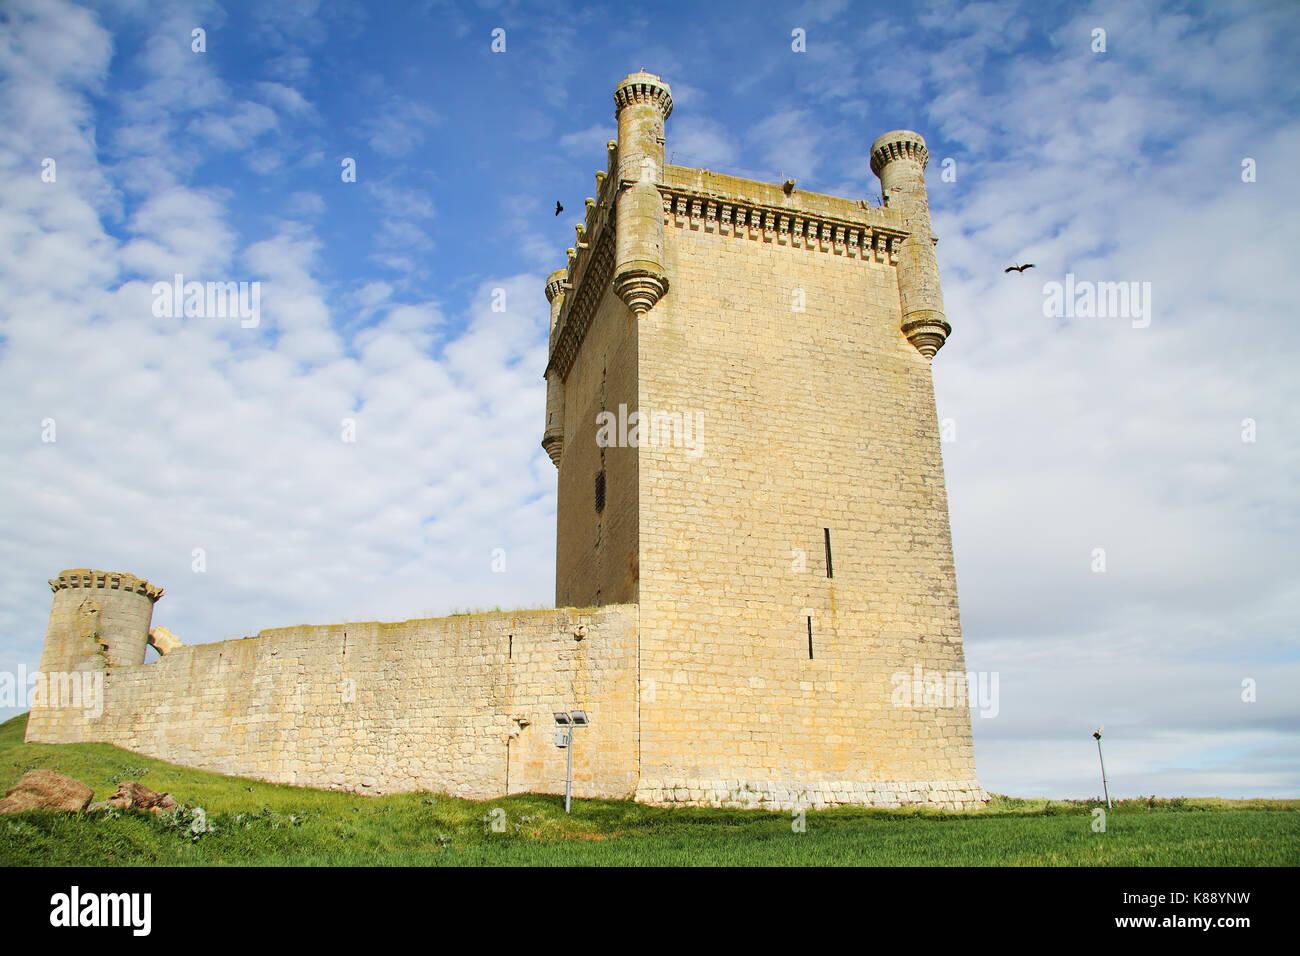 Castle of Belmonte, Palencia, Castilla y Leon, Spain - Stock Image